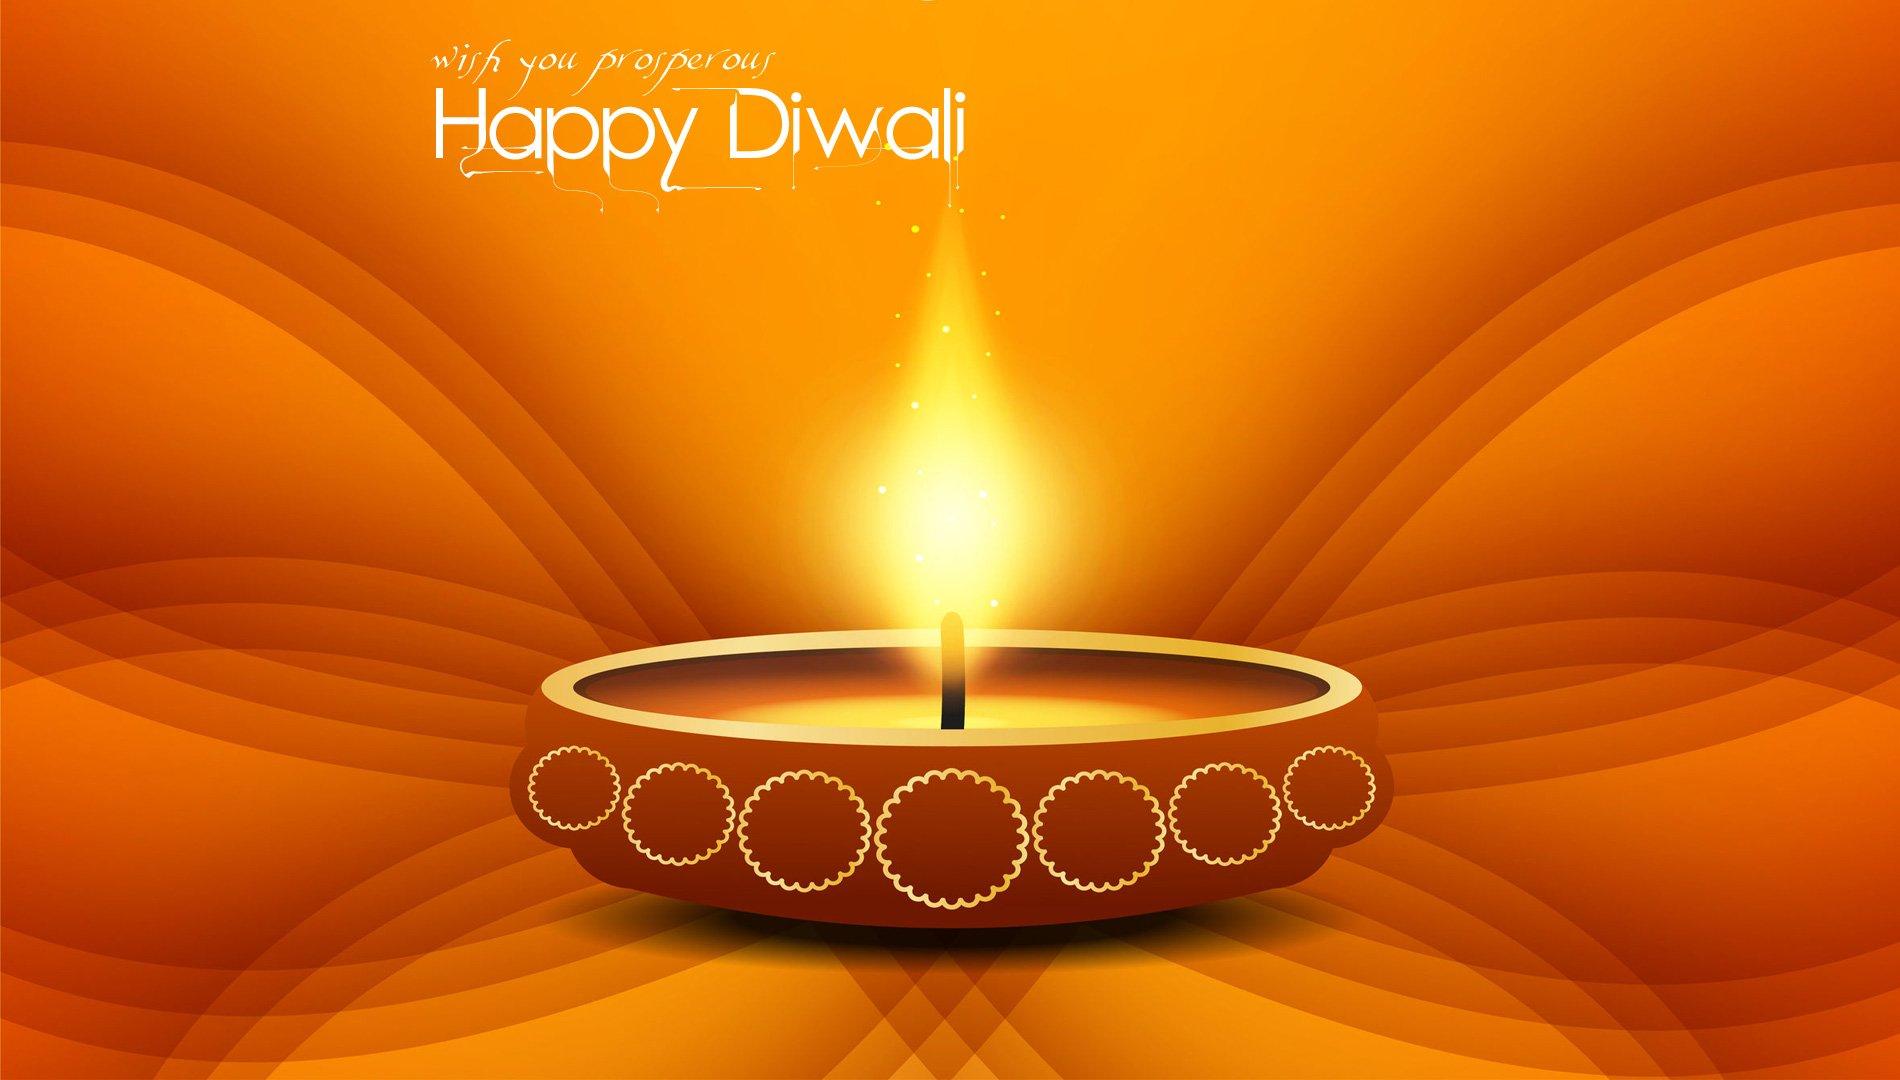 wish you prosperous happy diwali